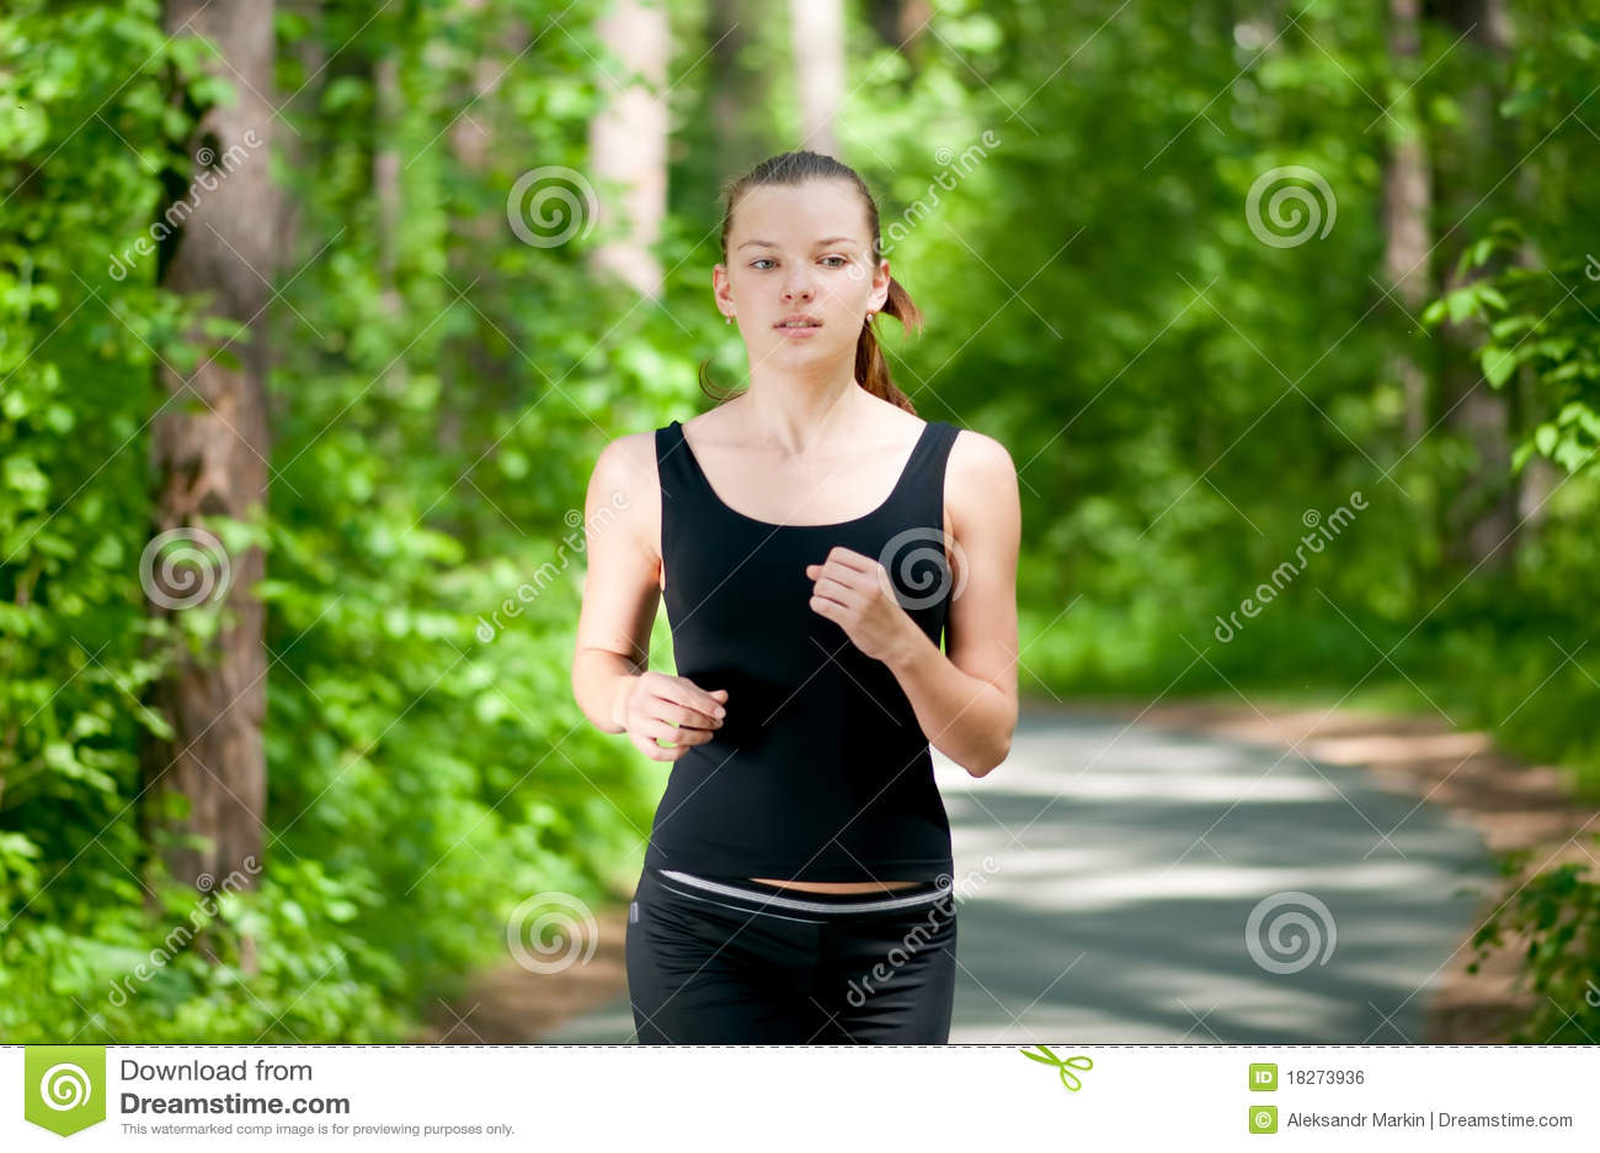 beautiful woman running in green park stock photo   image